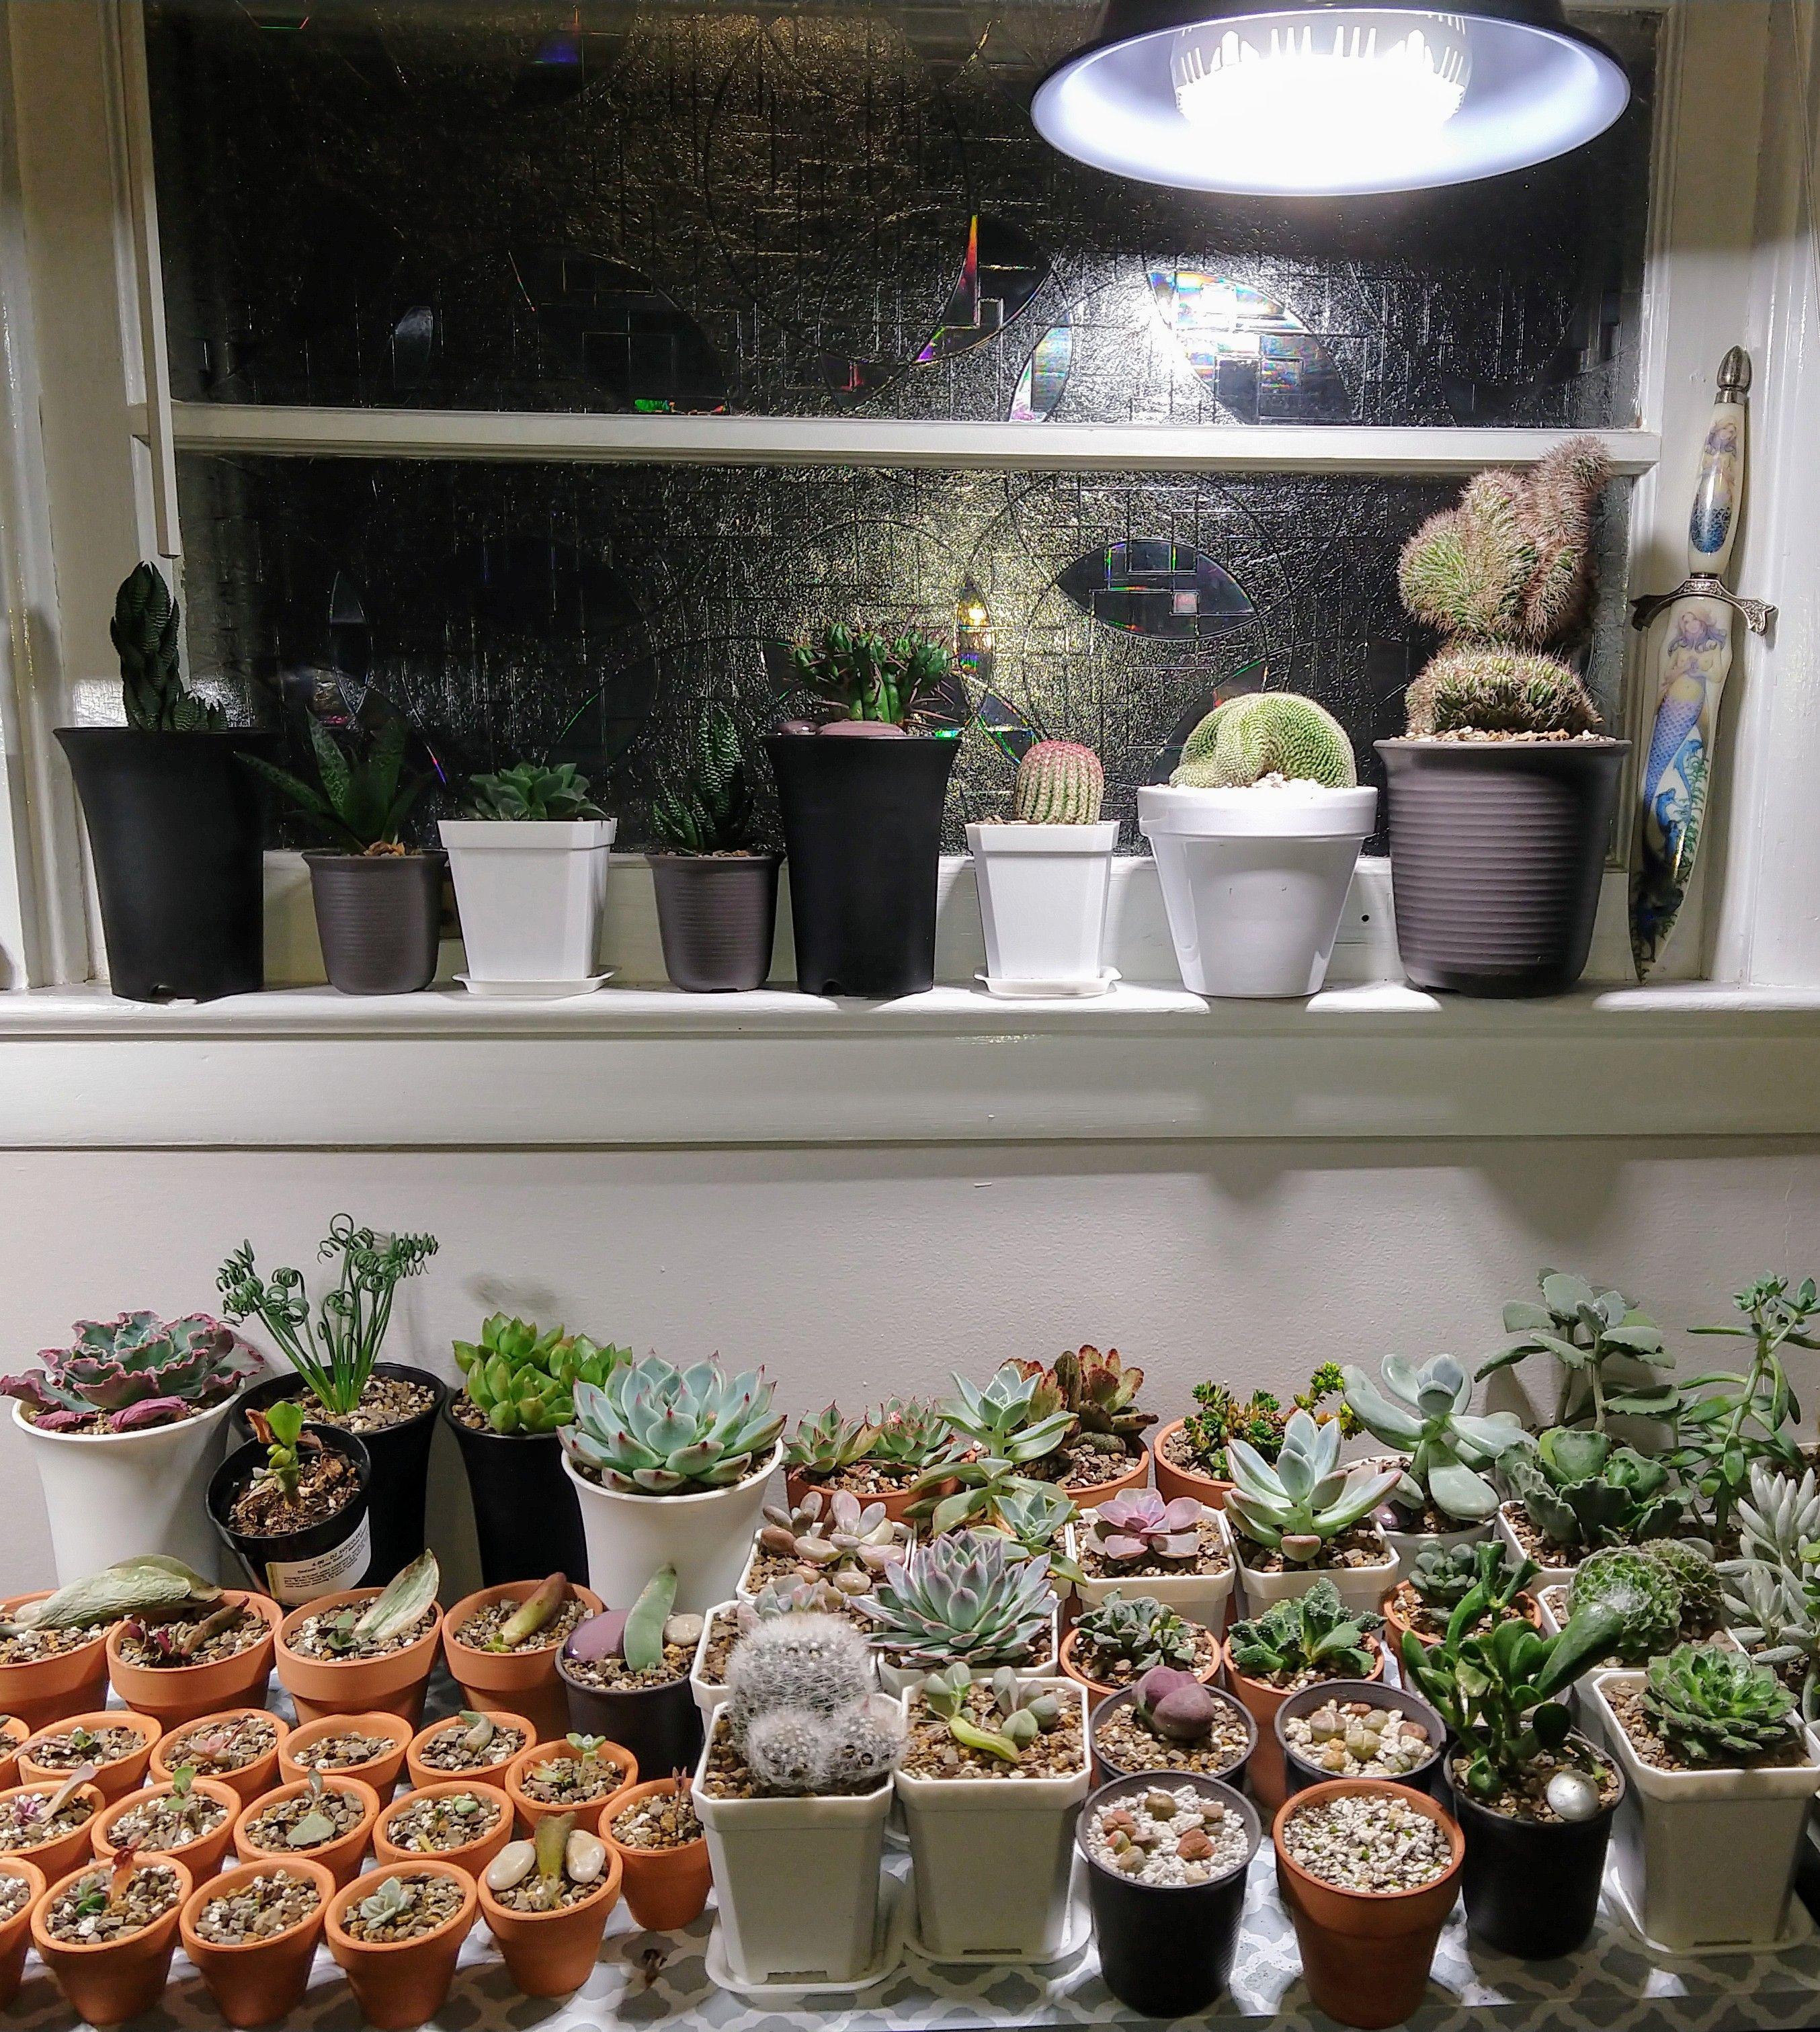 SANSI LED Security Lights, LED Bulbs, Grow Lights Grow